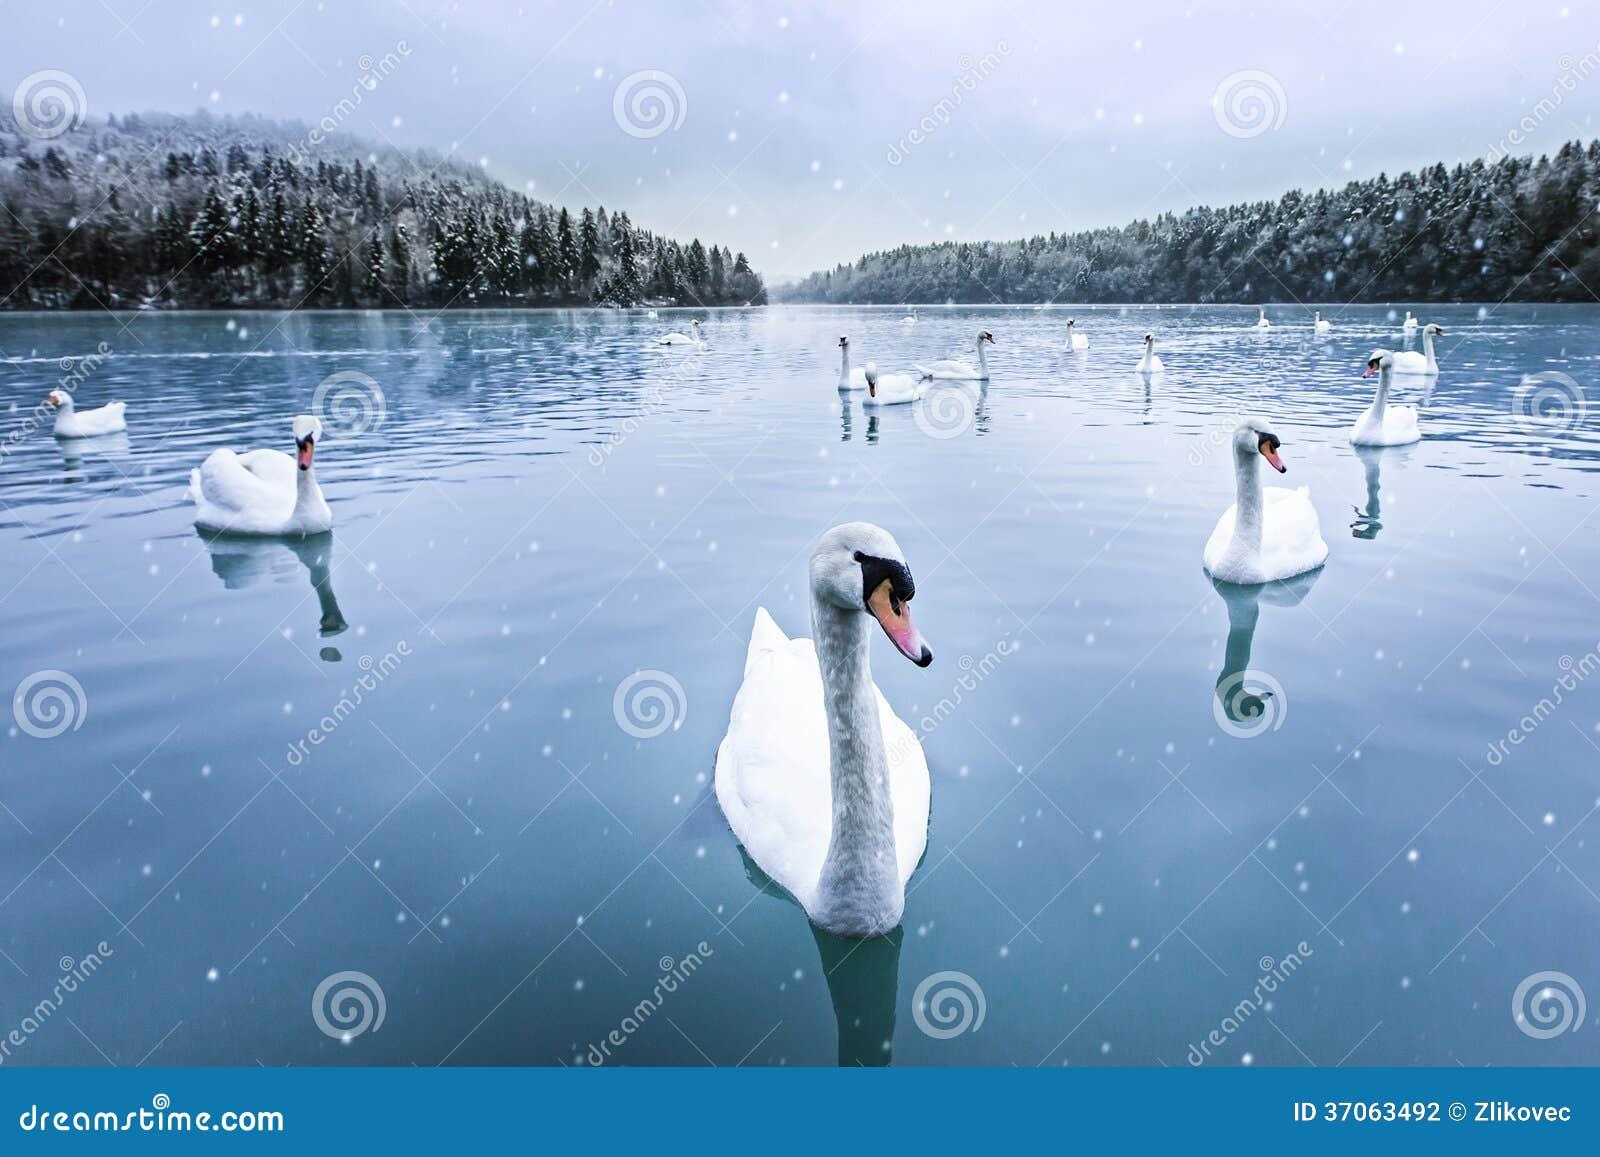 Swans, snow, lake, winter